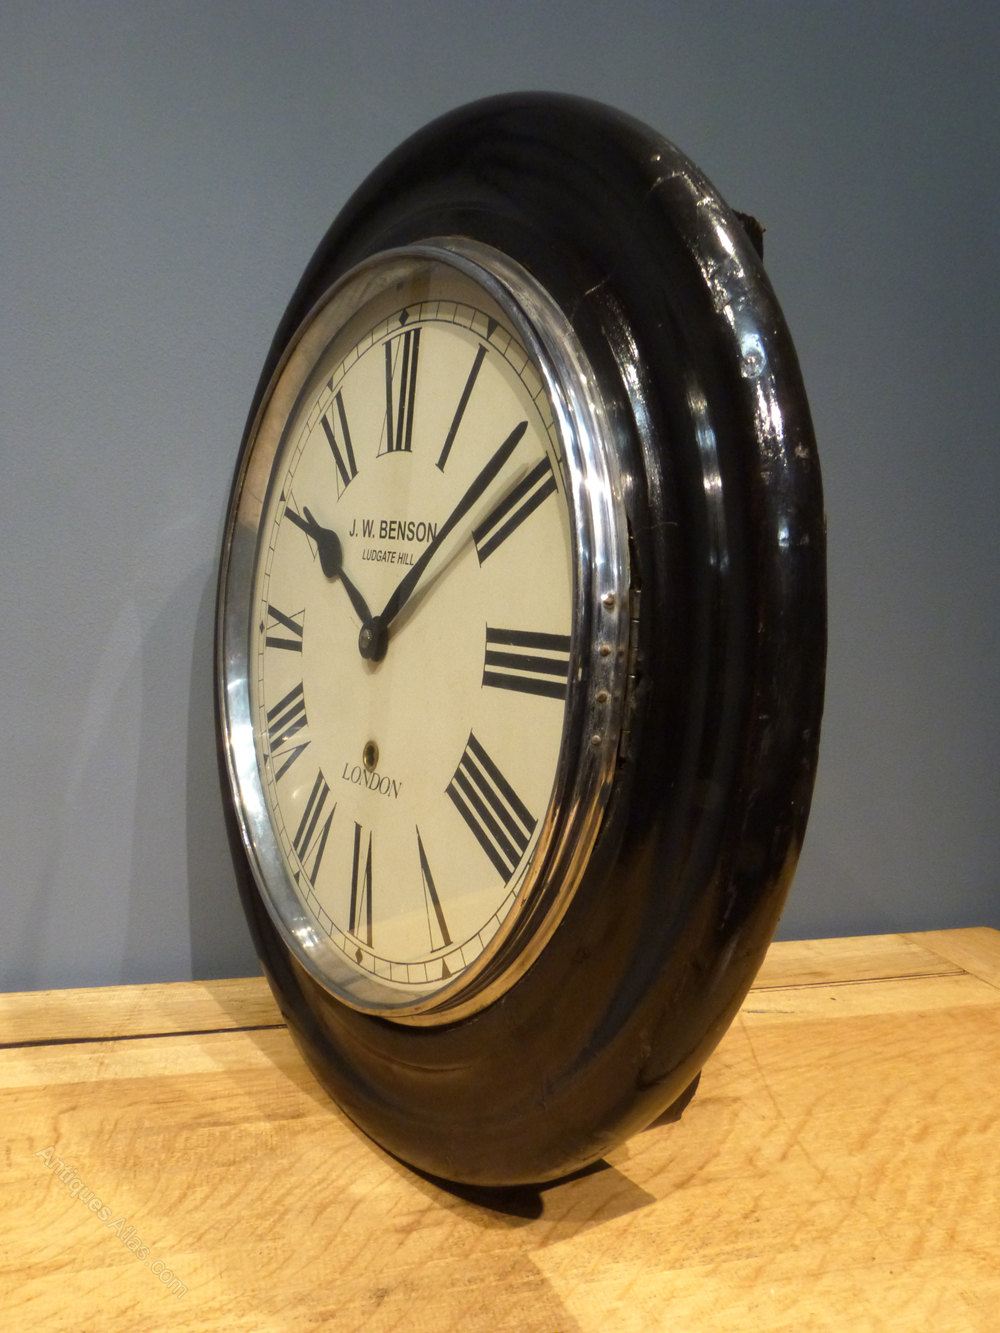 Antiques Atlas Jw Benson London Station Clock